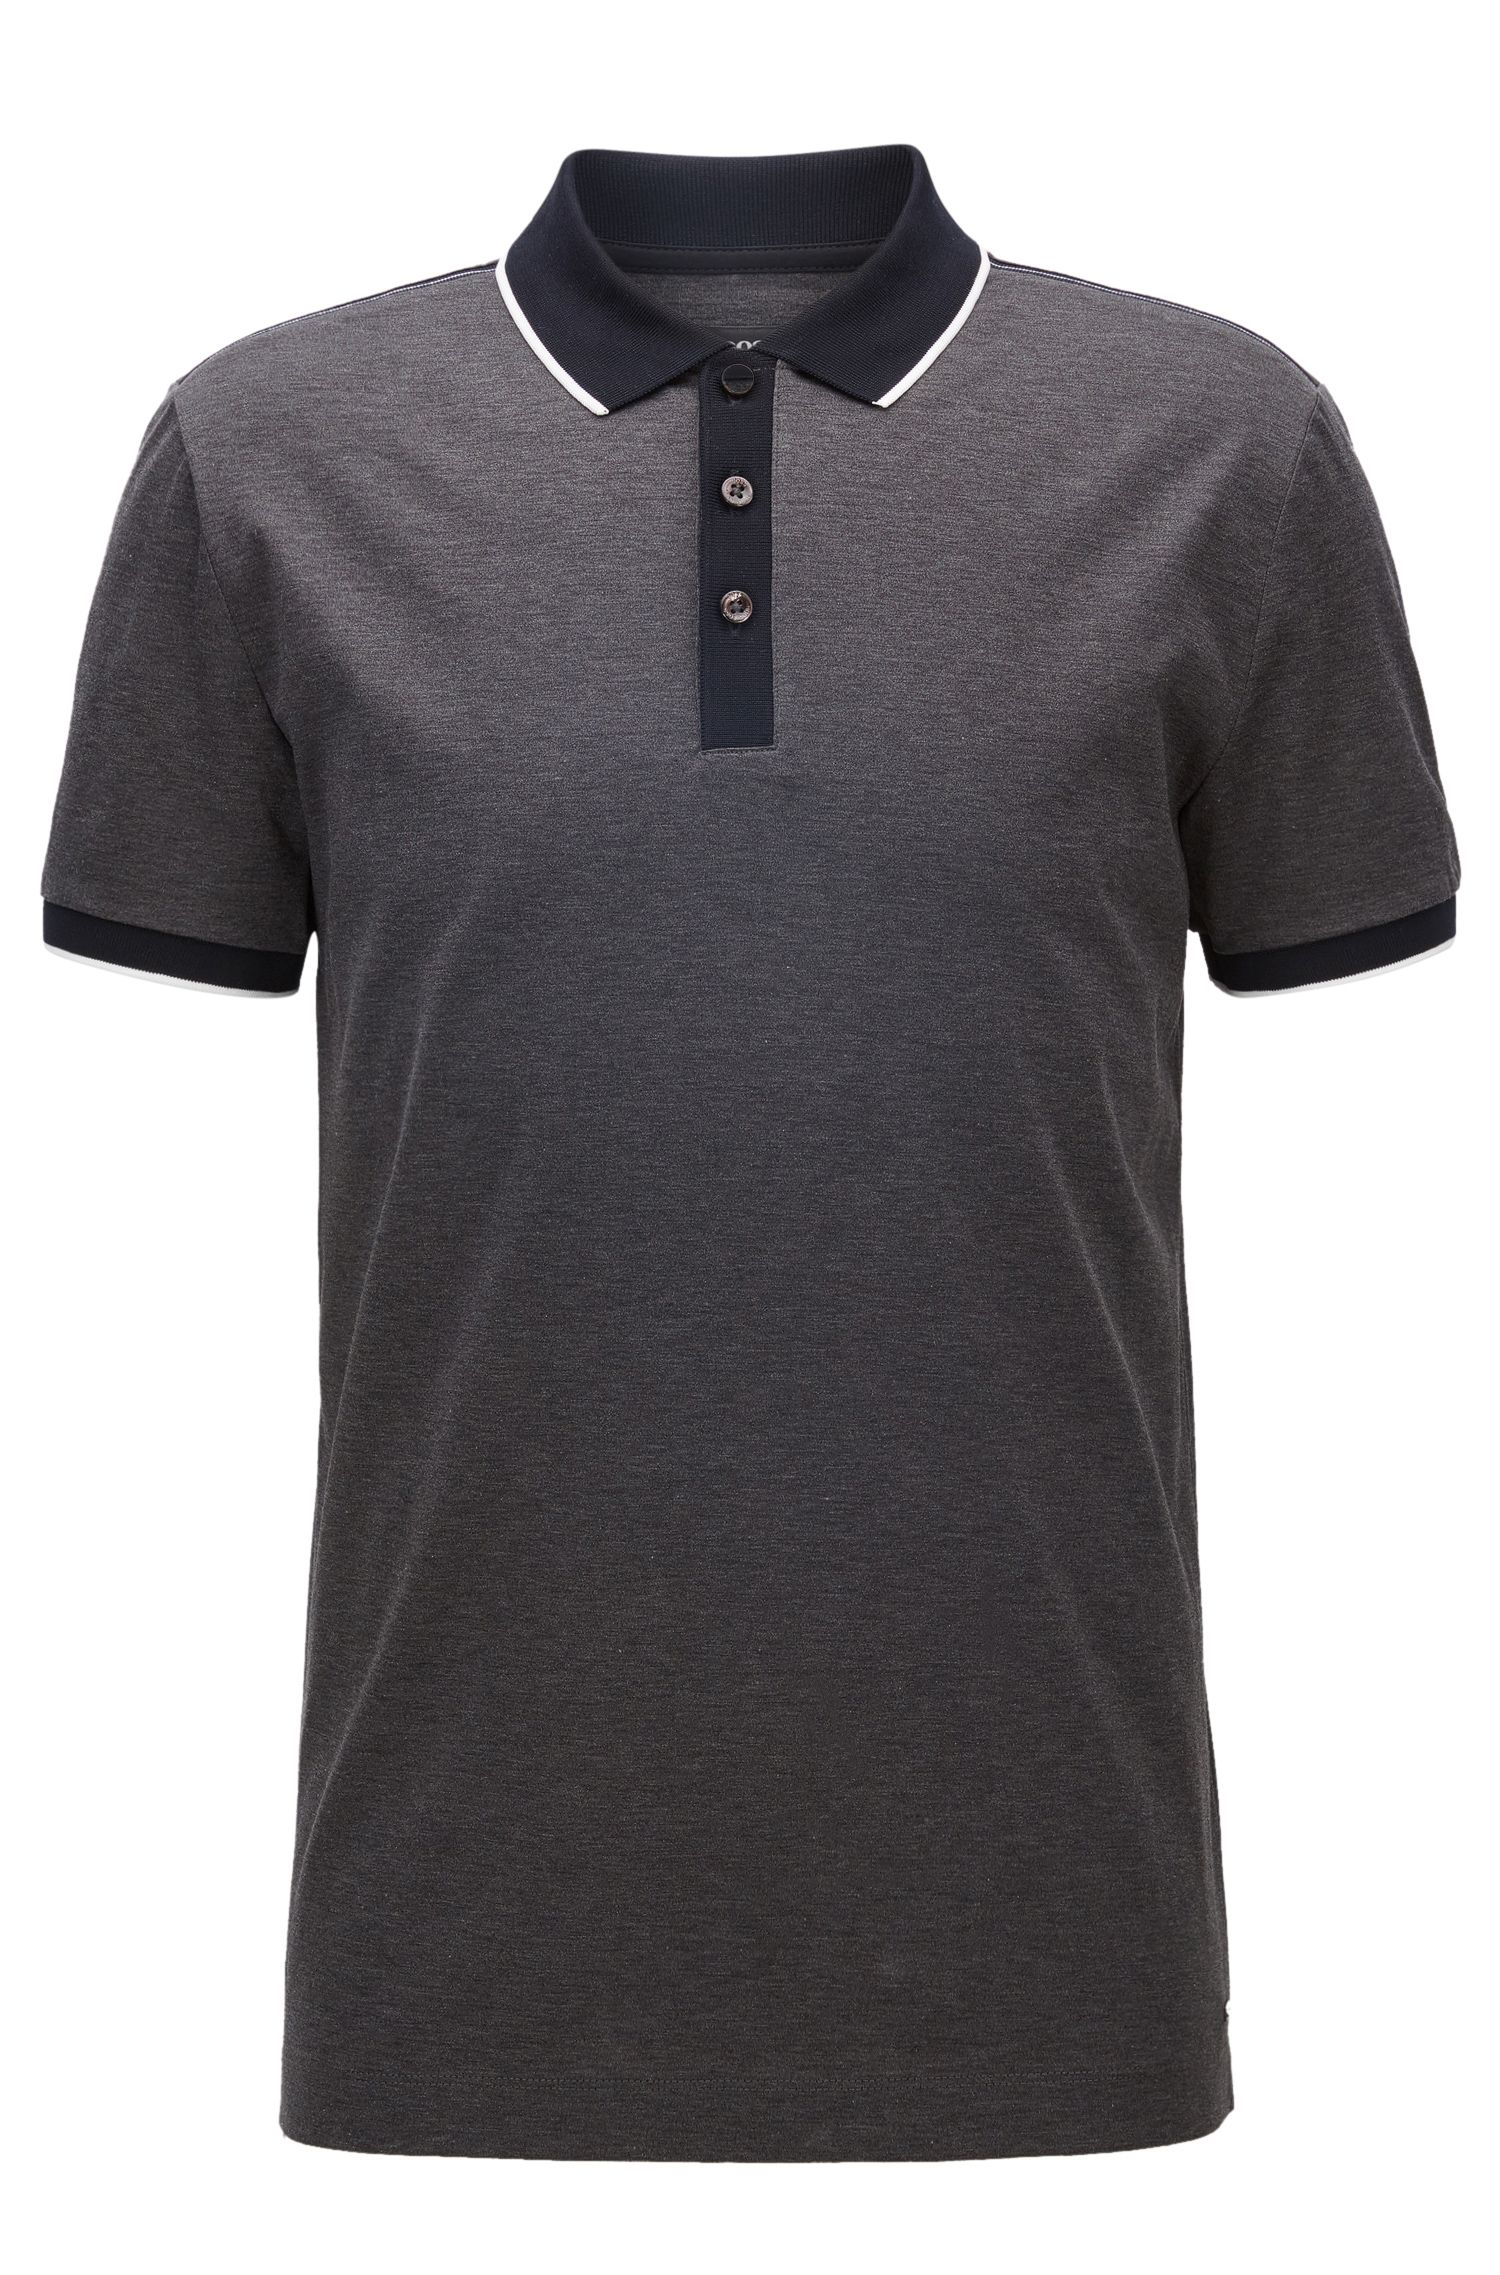 'Phillipson'   Coloblocked Cotton Polo Shirt